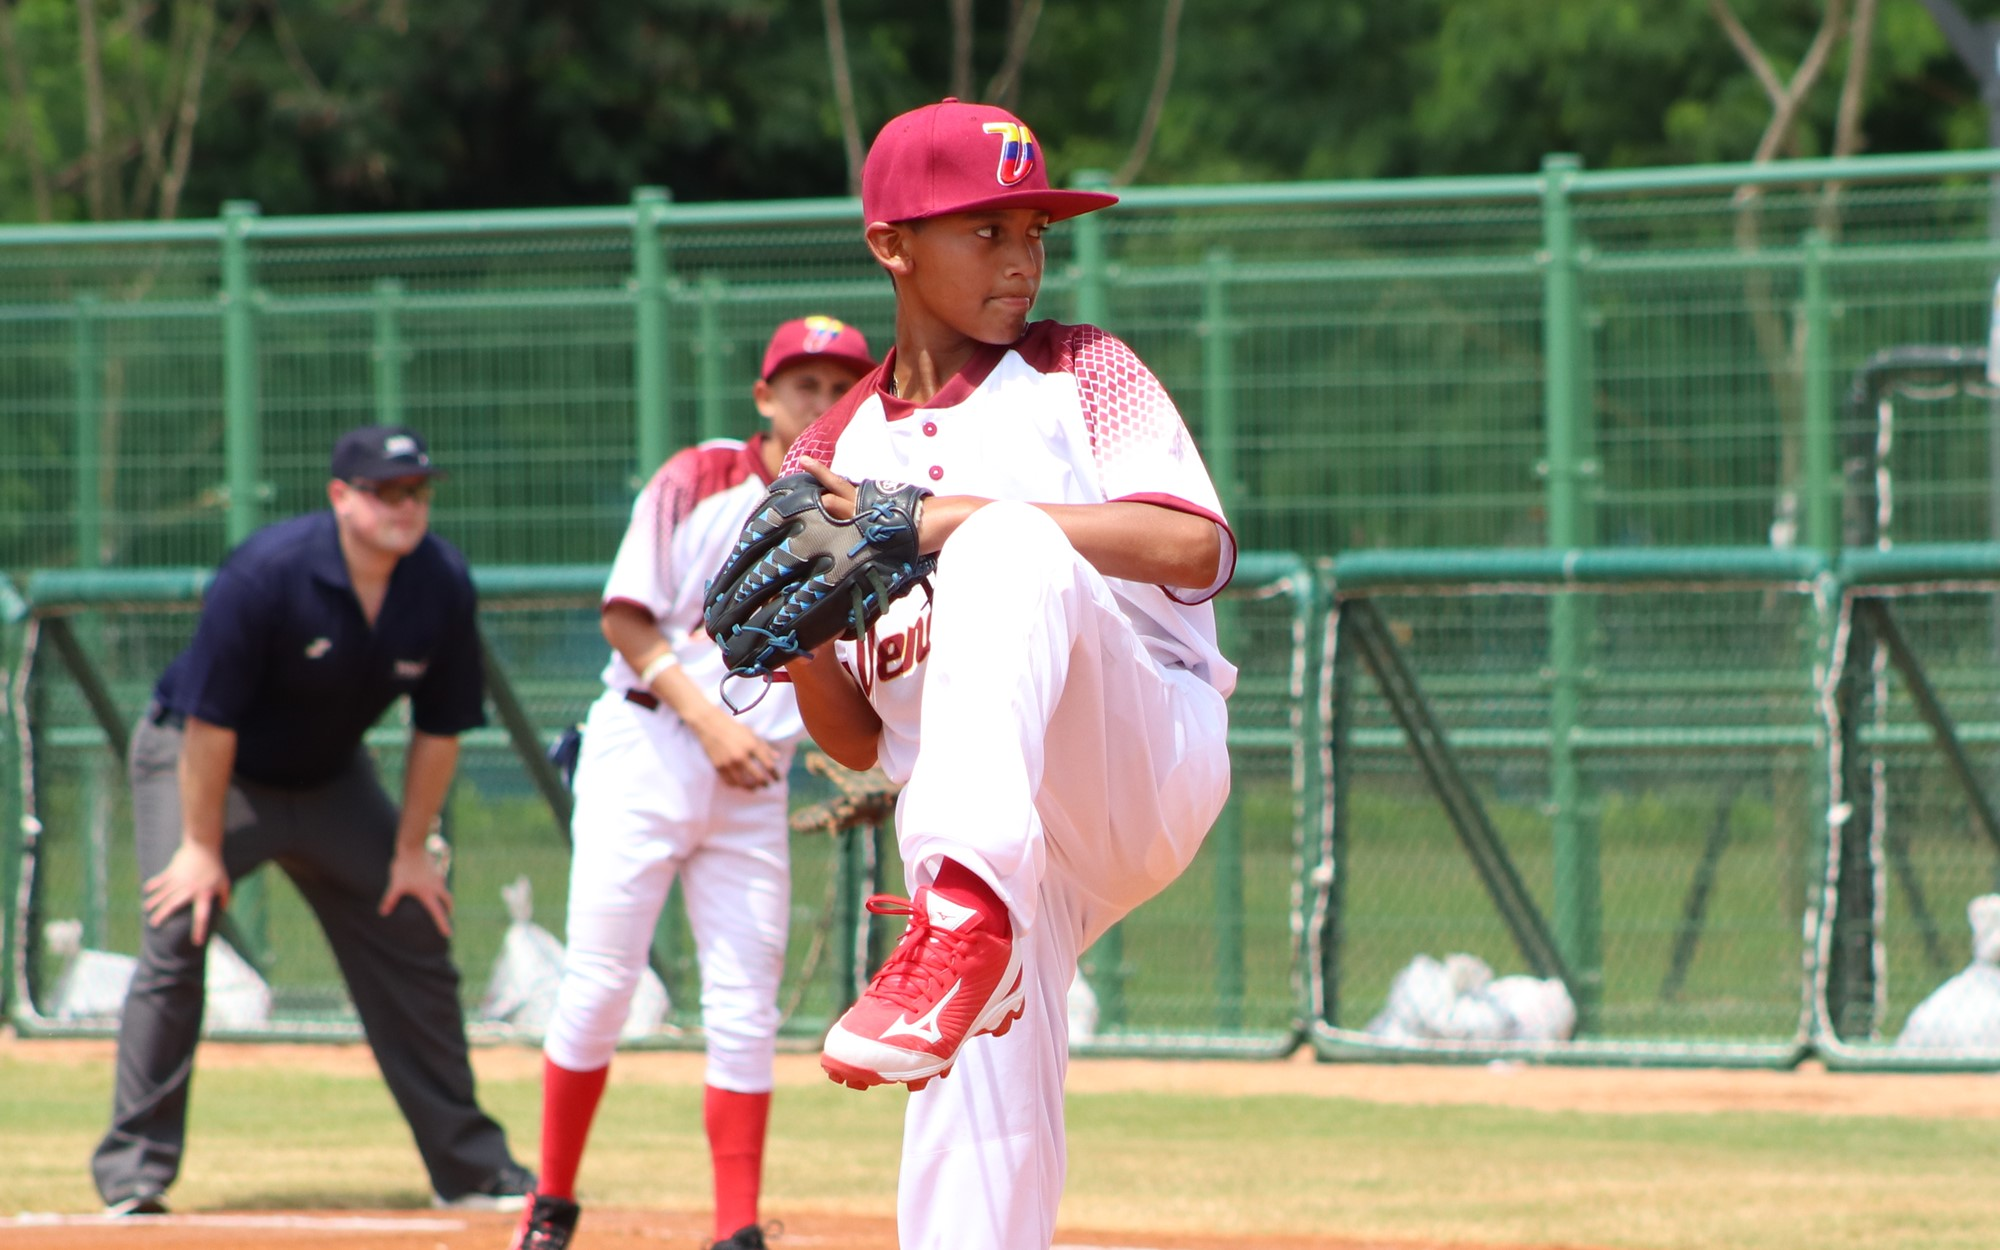 Venezuela's starter Trujillo